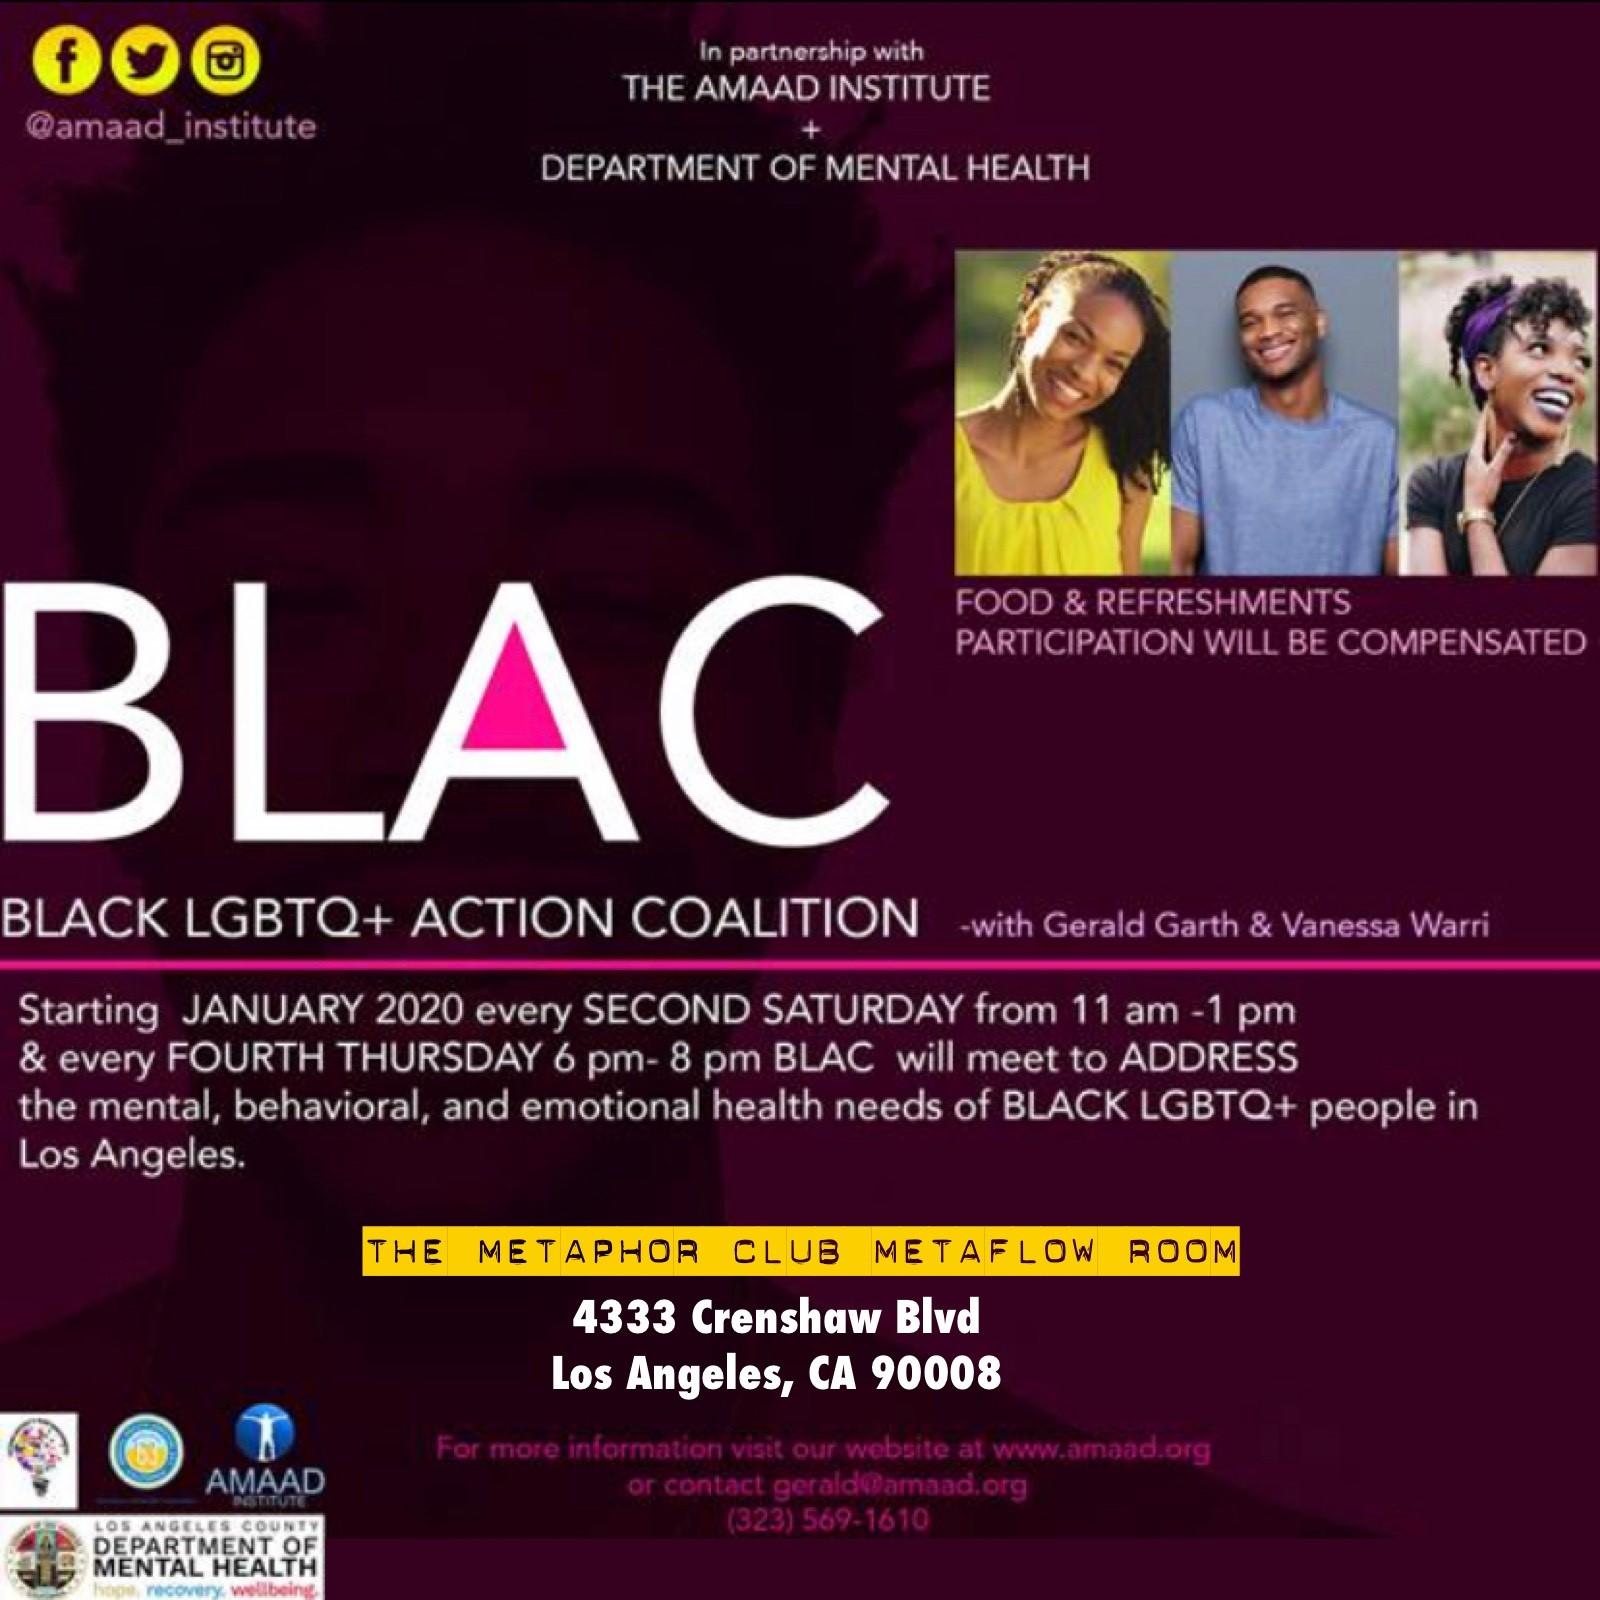 BLAC_flyer_updated.jpg